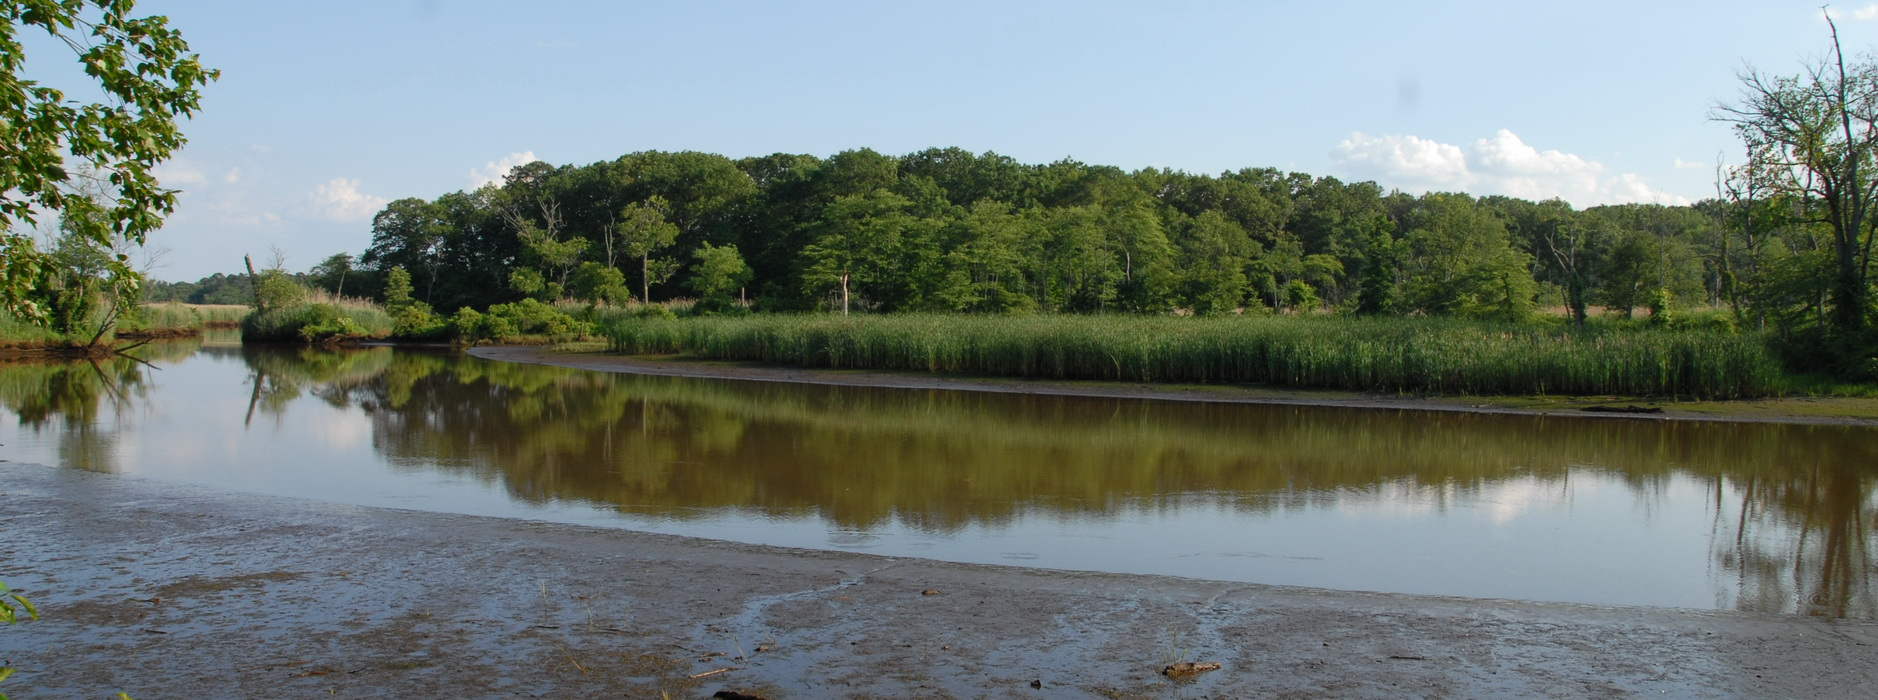 marsh, mudd, river, shoreline, trees, water